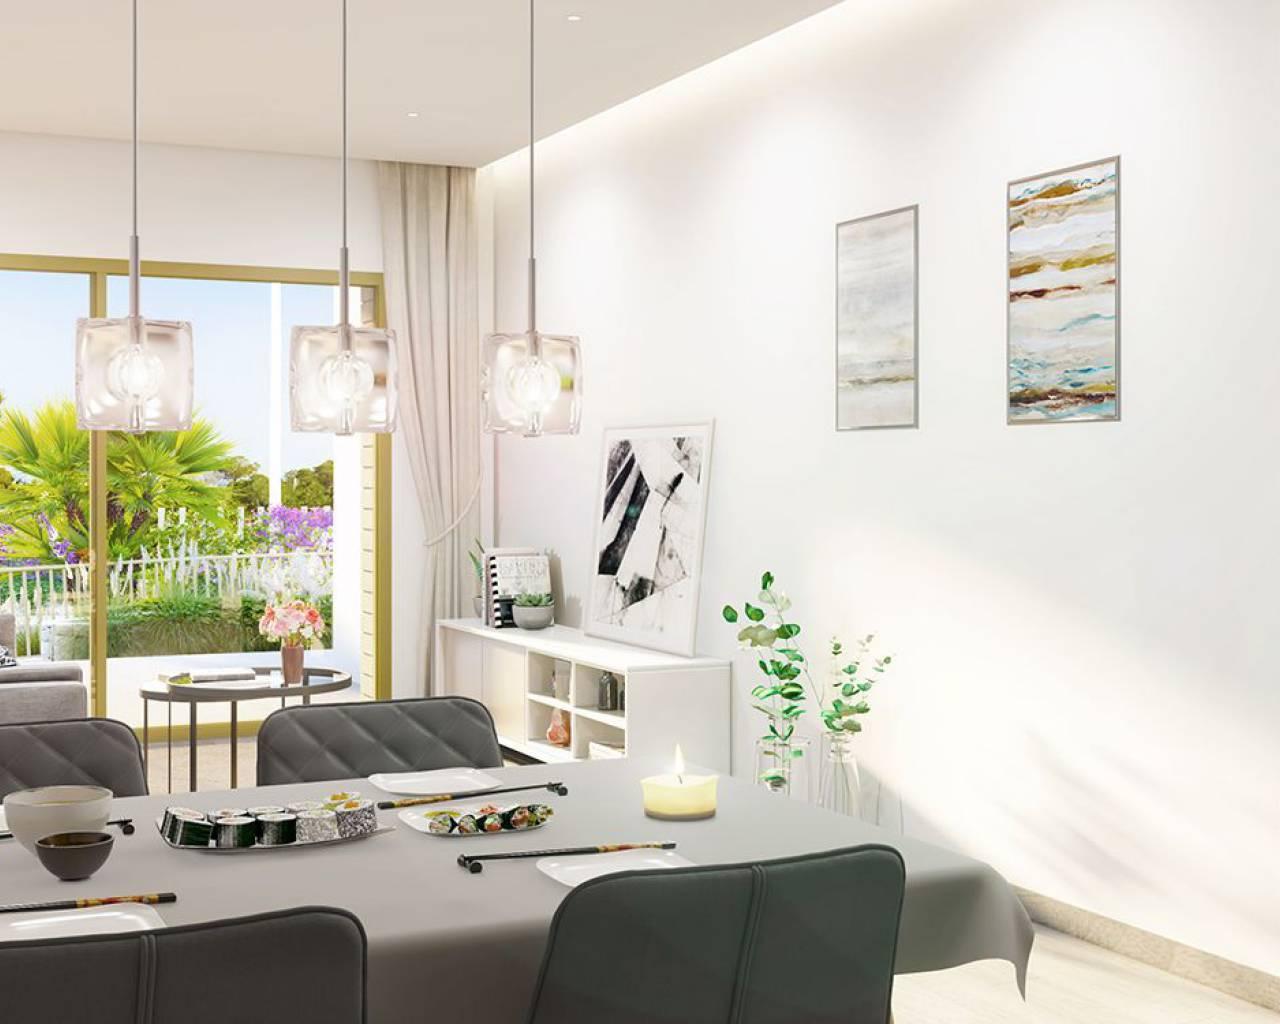 nieuwbouw-appartement-pilar-de-la-horadada_5794_xl